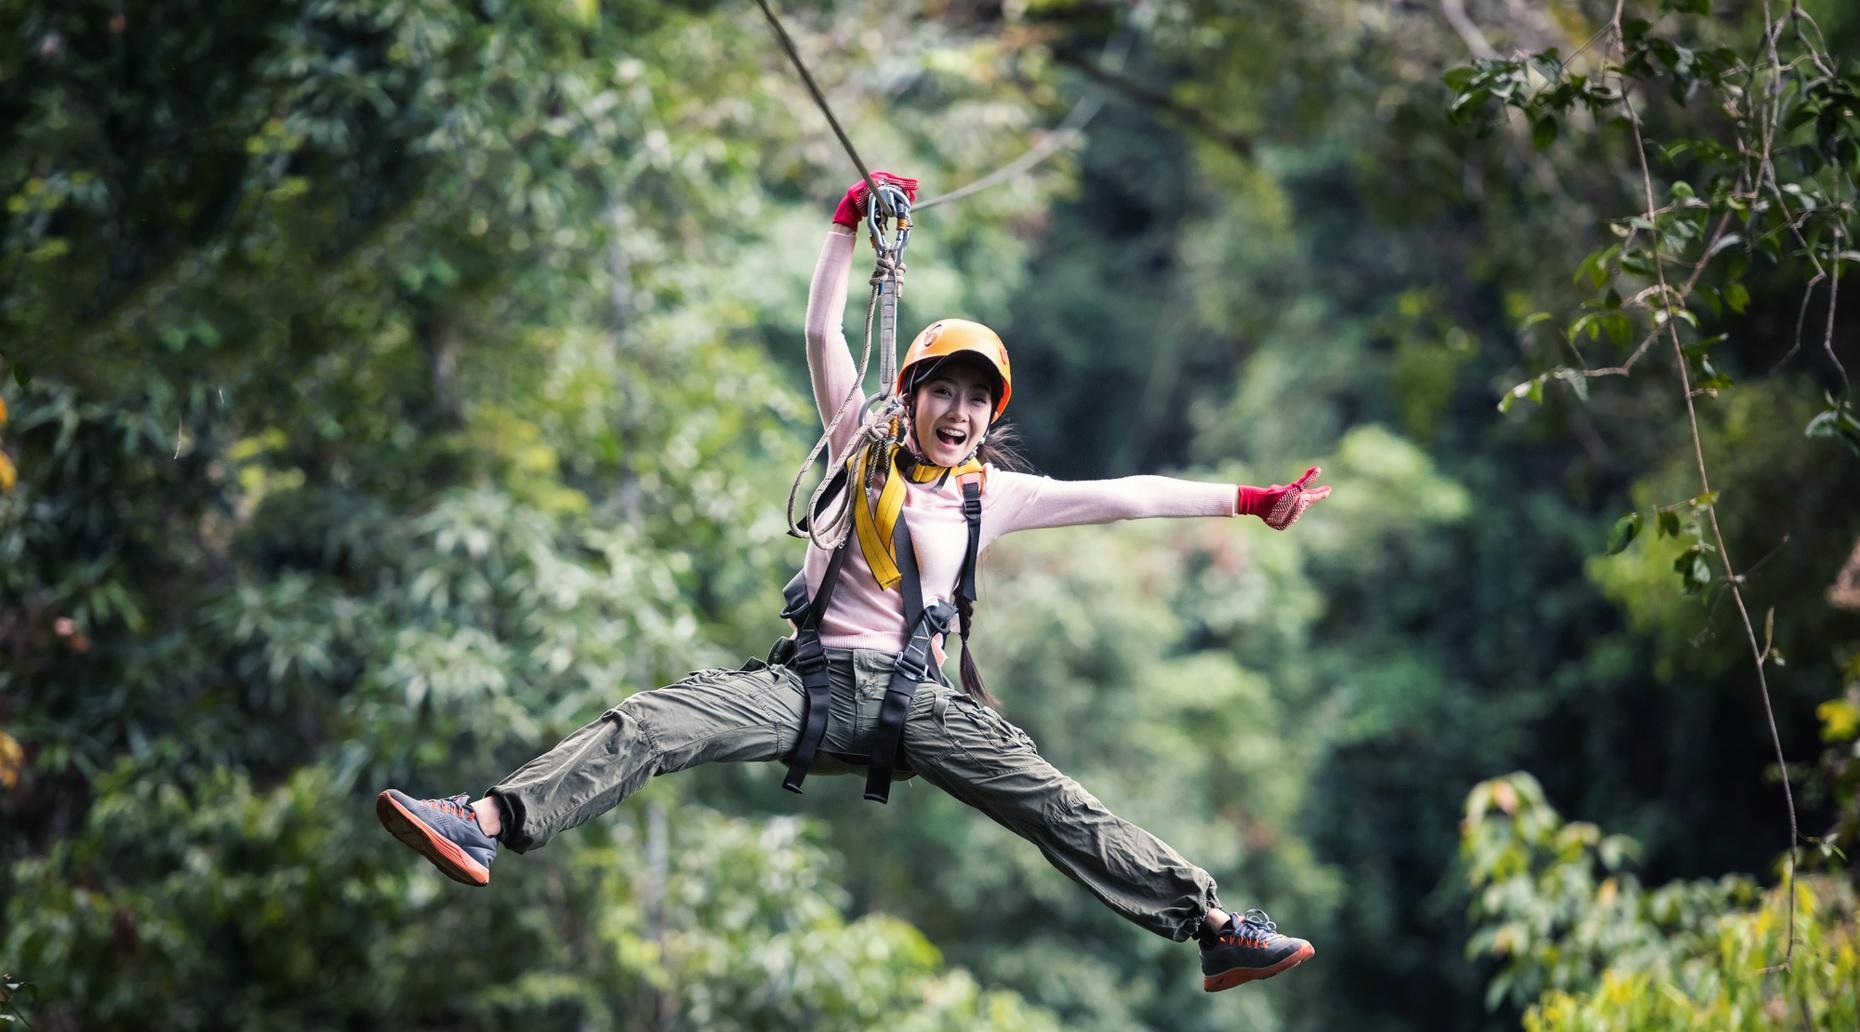 Ziplining & Snowtubing Combo Adventure in Branson